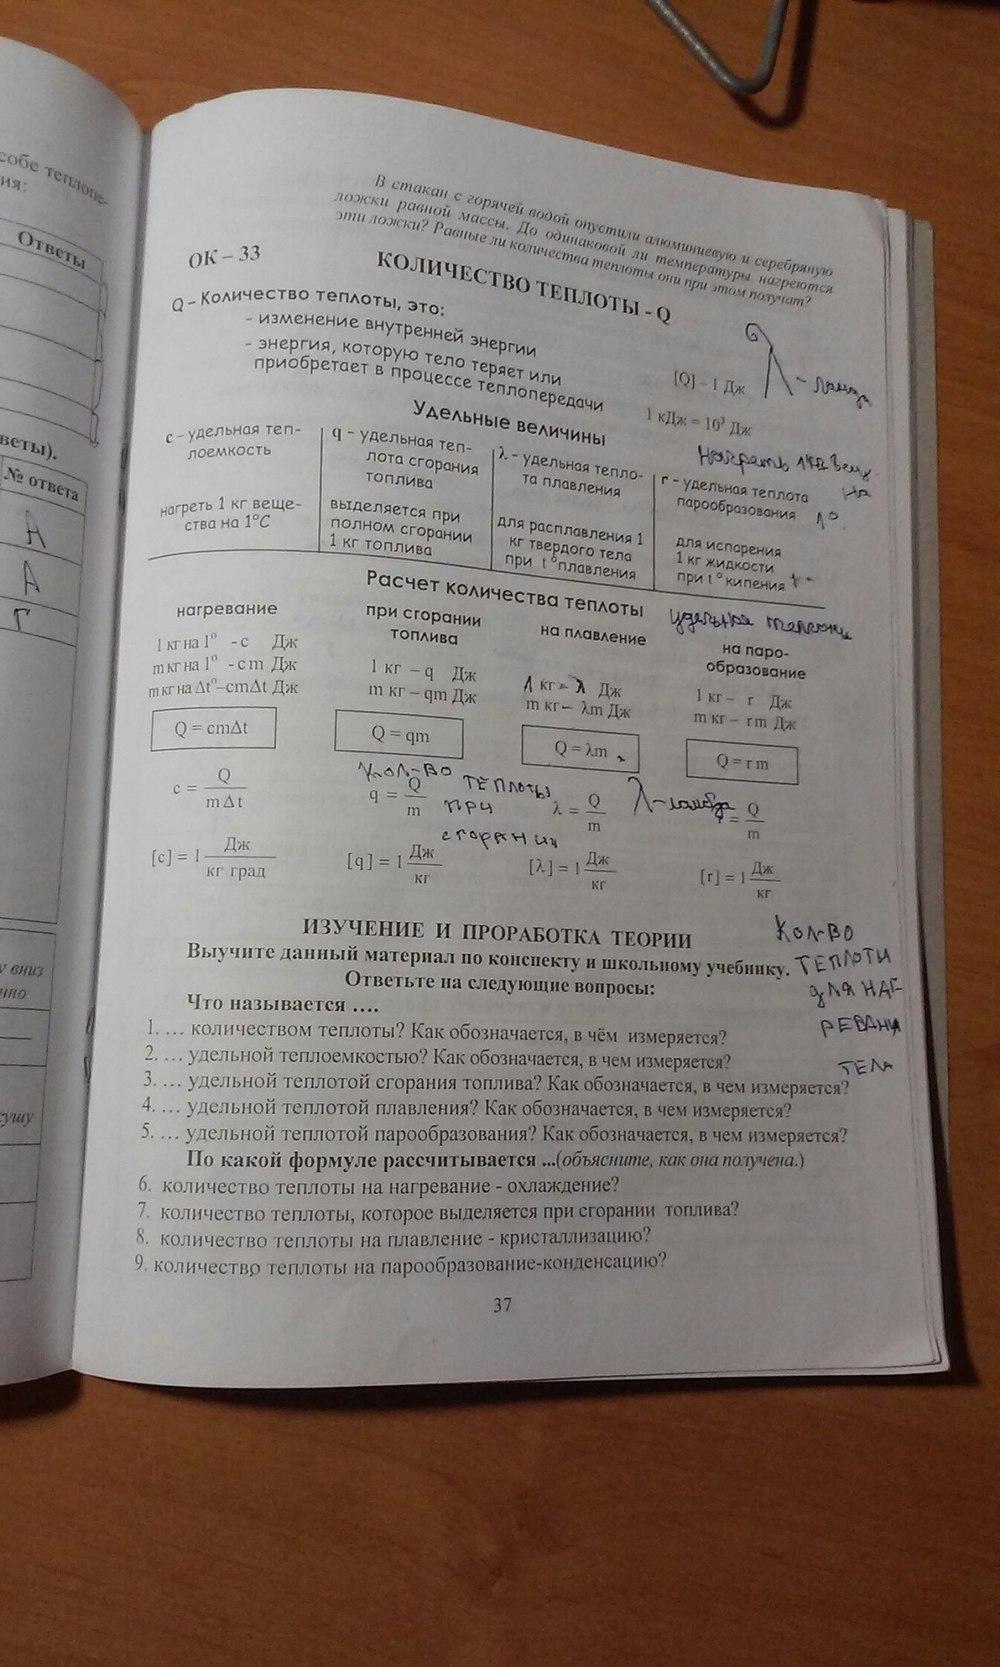 решебник по физике 7 класс лифарь.св тарарина и.н